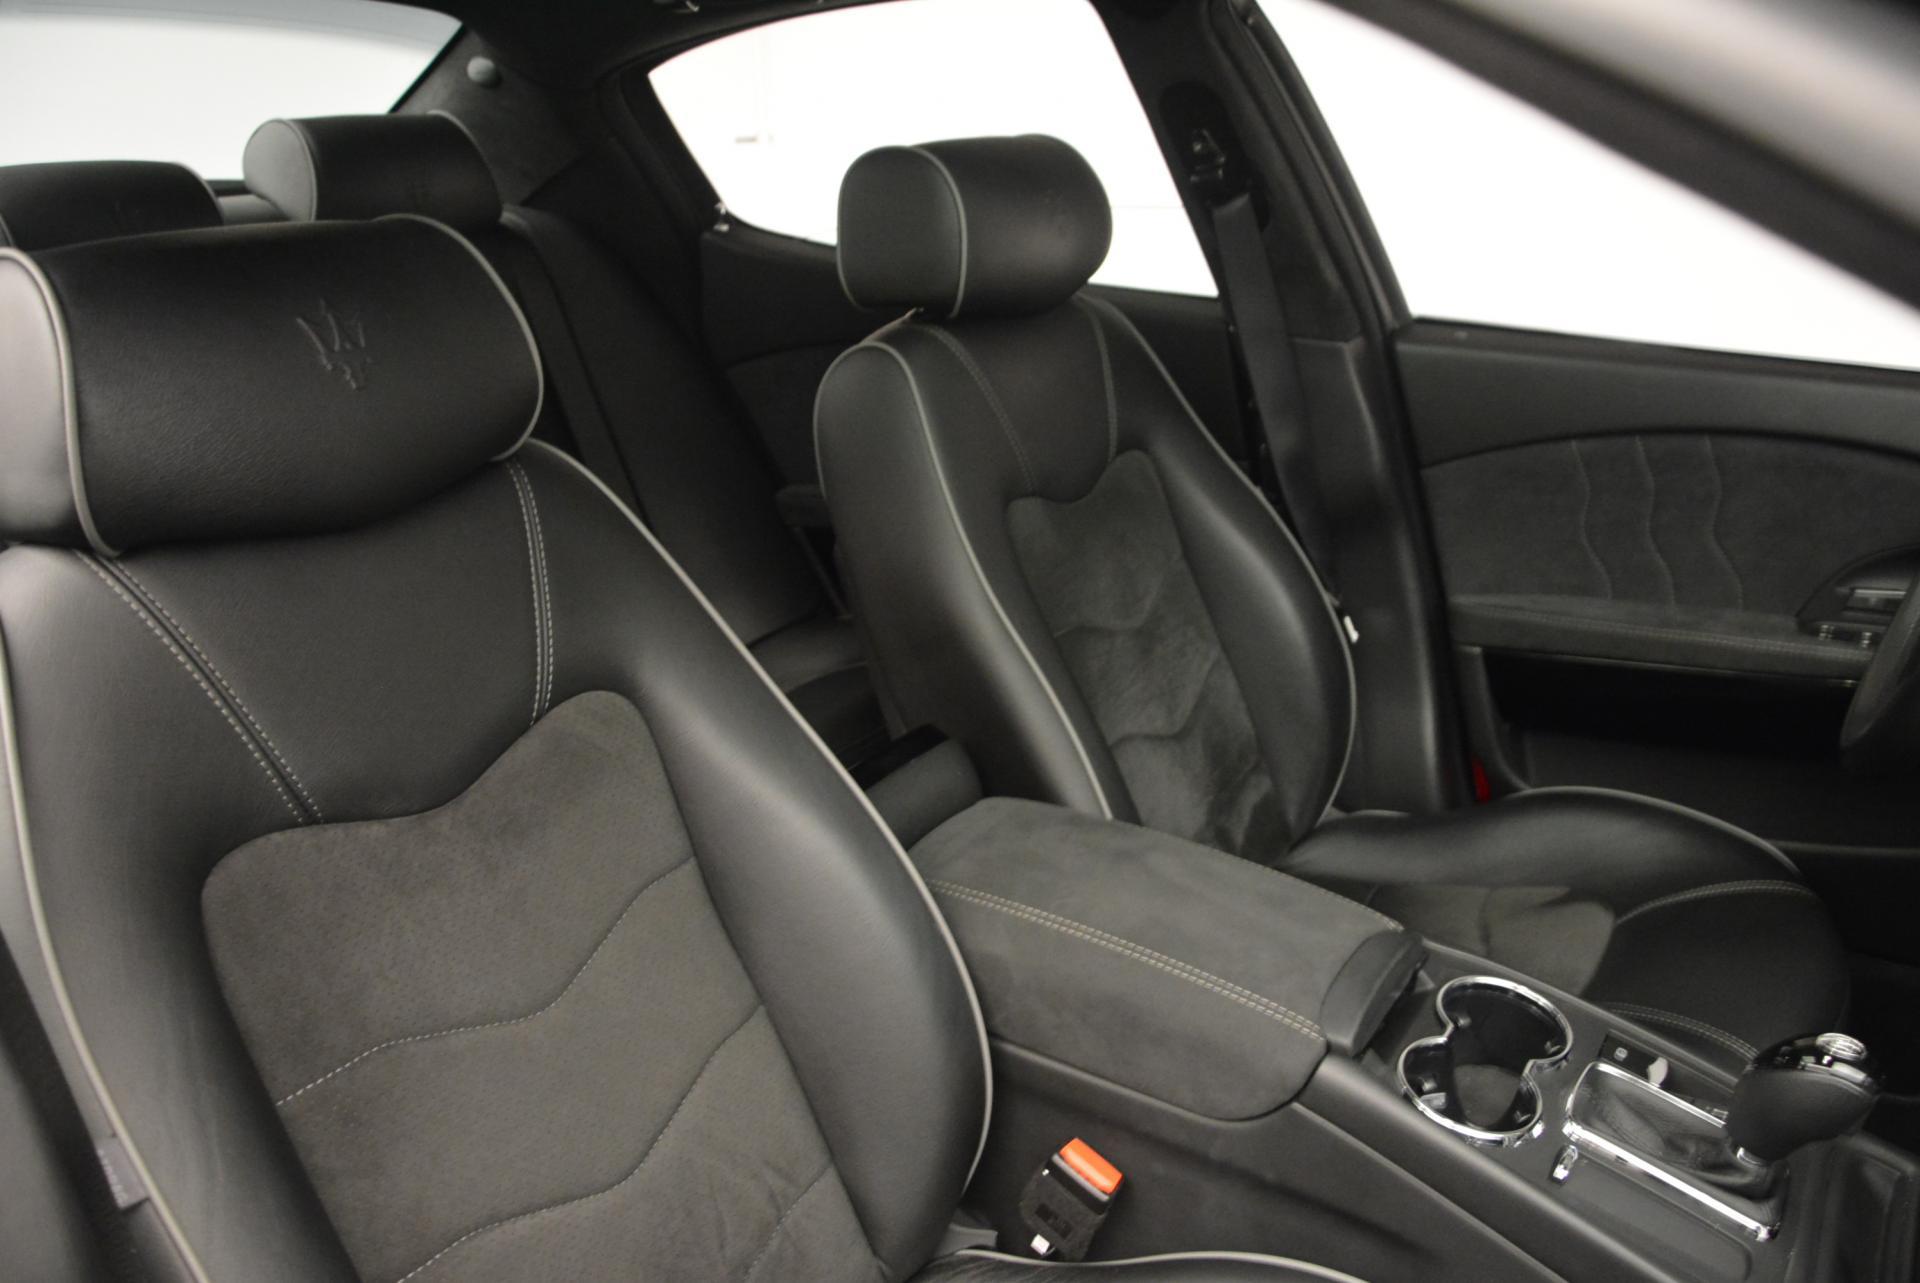 Used 2011 Maserati Quattroporte Sport GT S For Sale In Westport, CT 531_p24